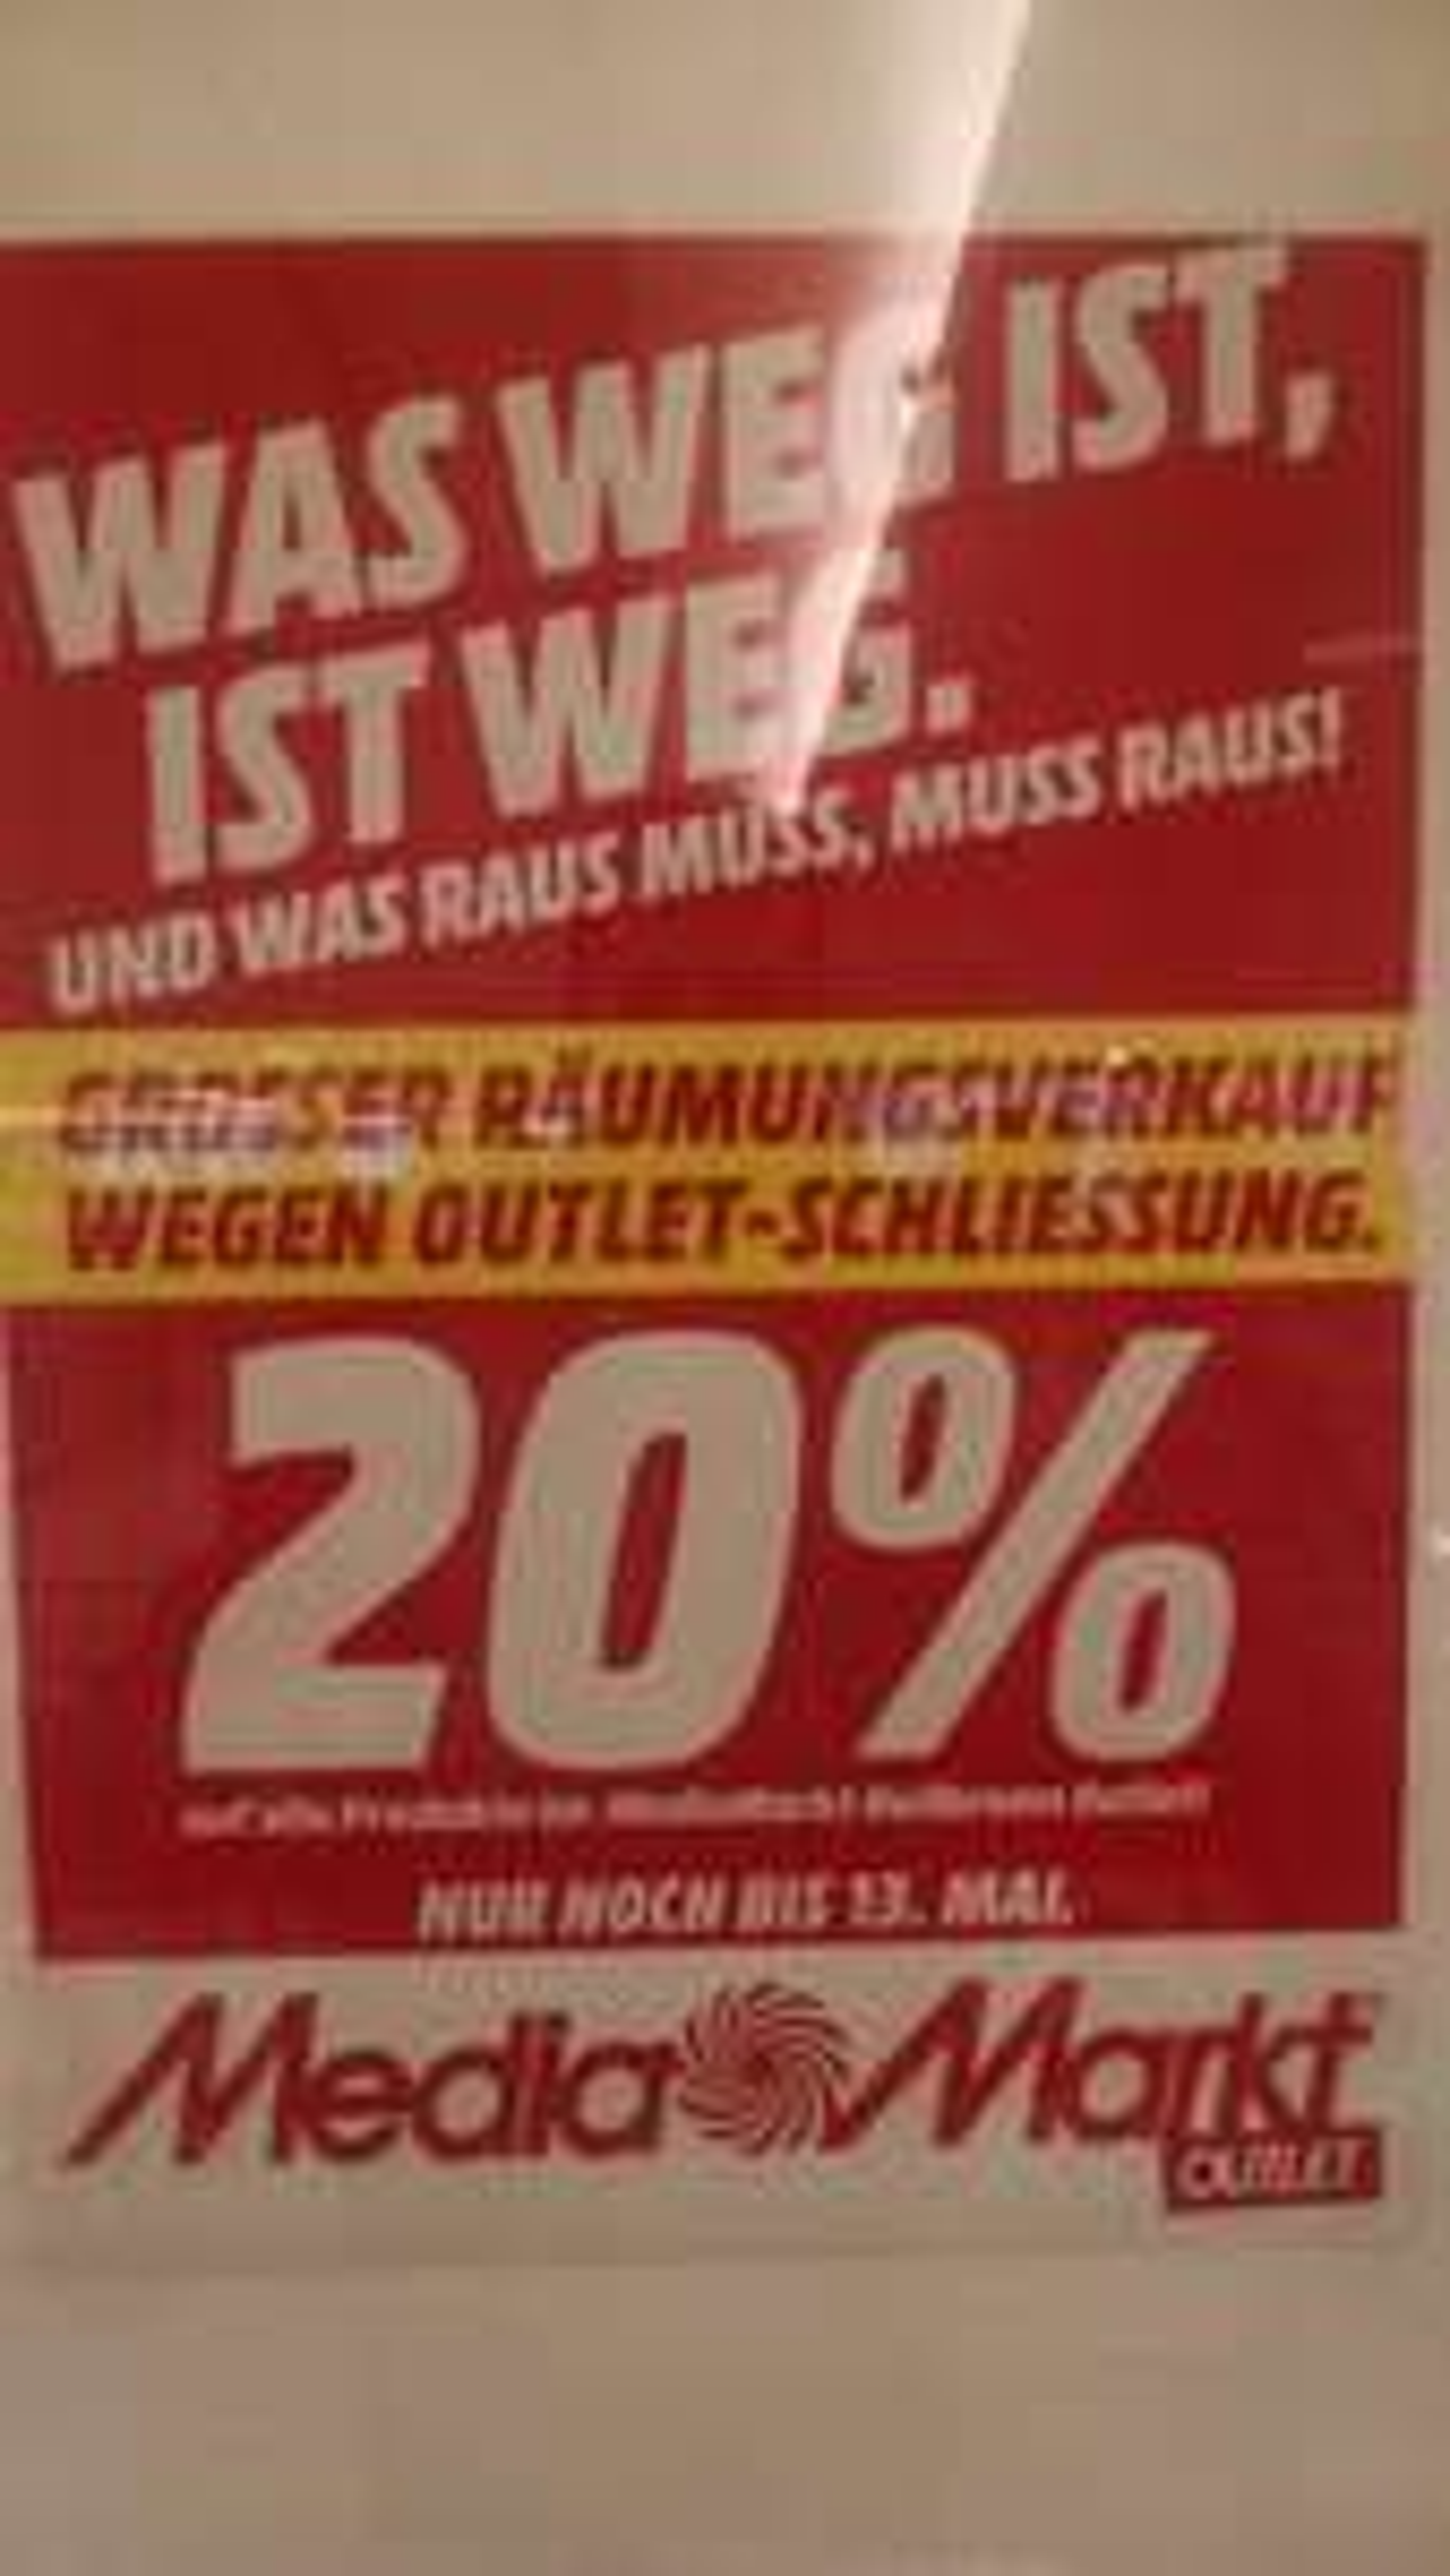 Lokal Media Markt Heilbronn Outlet 20% auf alles